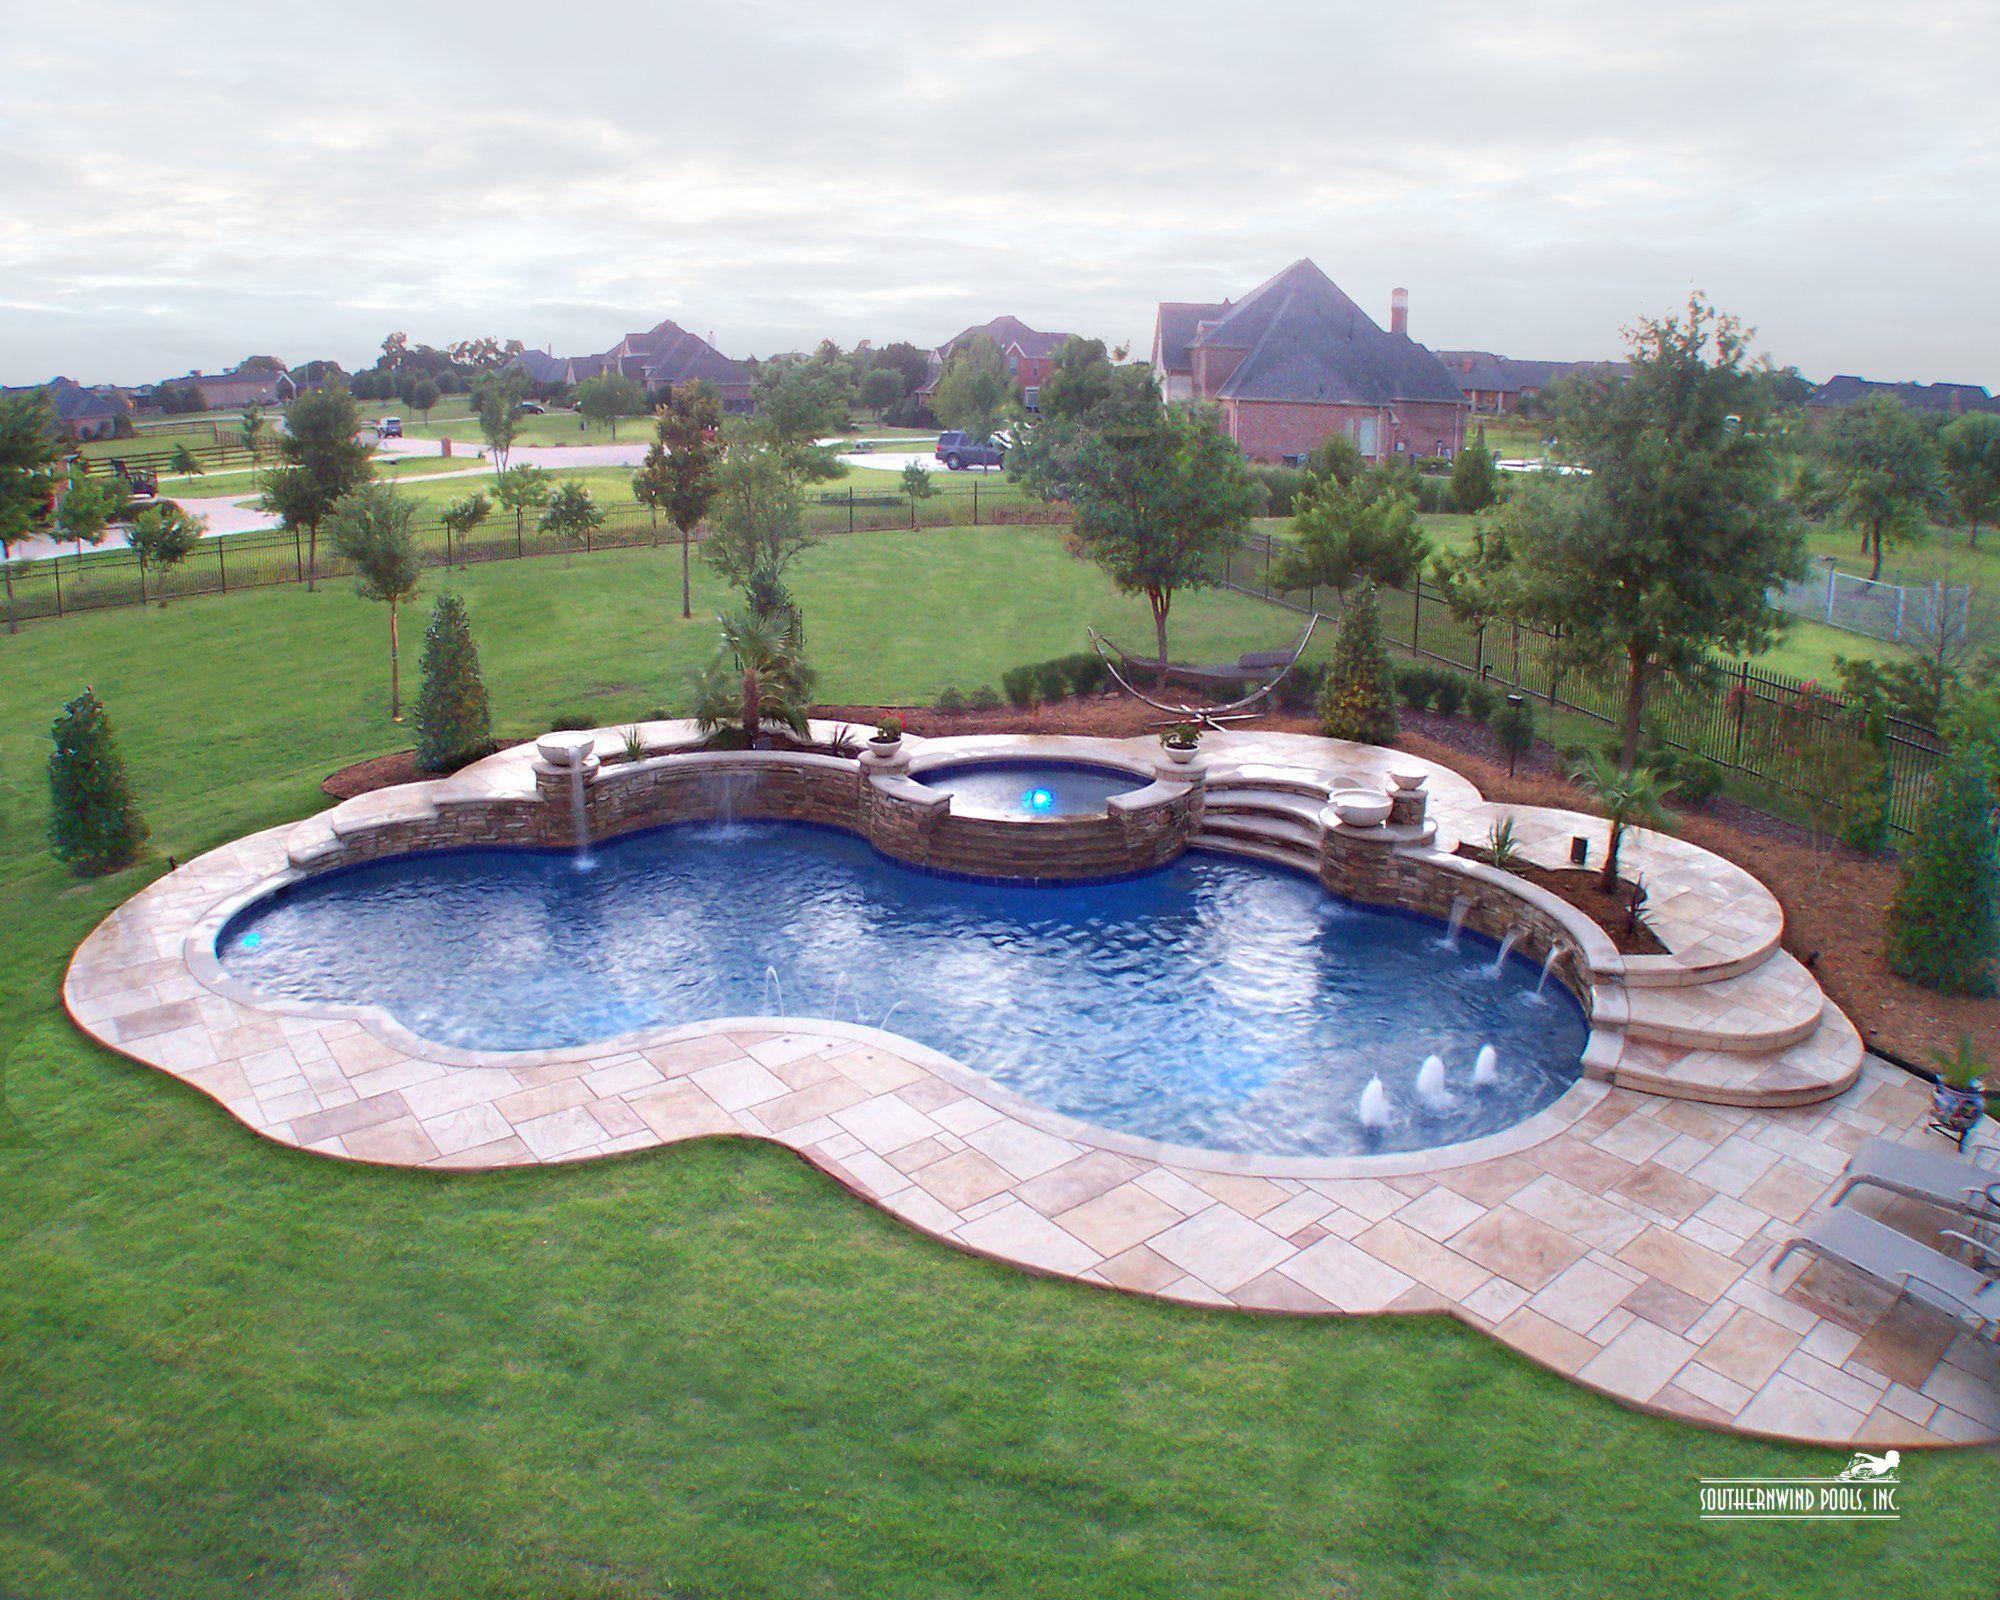 Free Form Swimming Pool Designs Natural  Freeform Pool 069Southernwind Pools  Pool Ideas